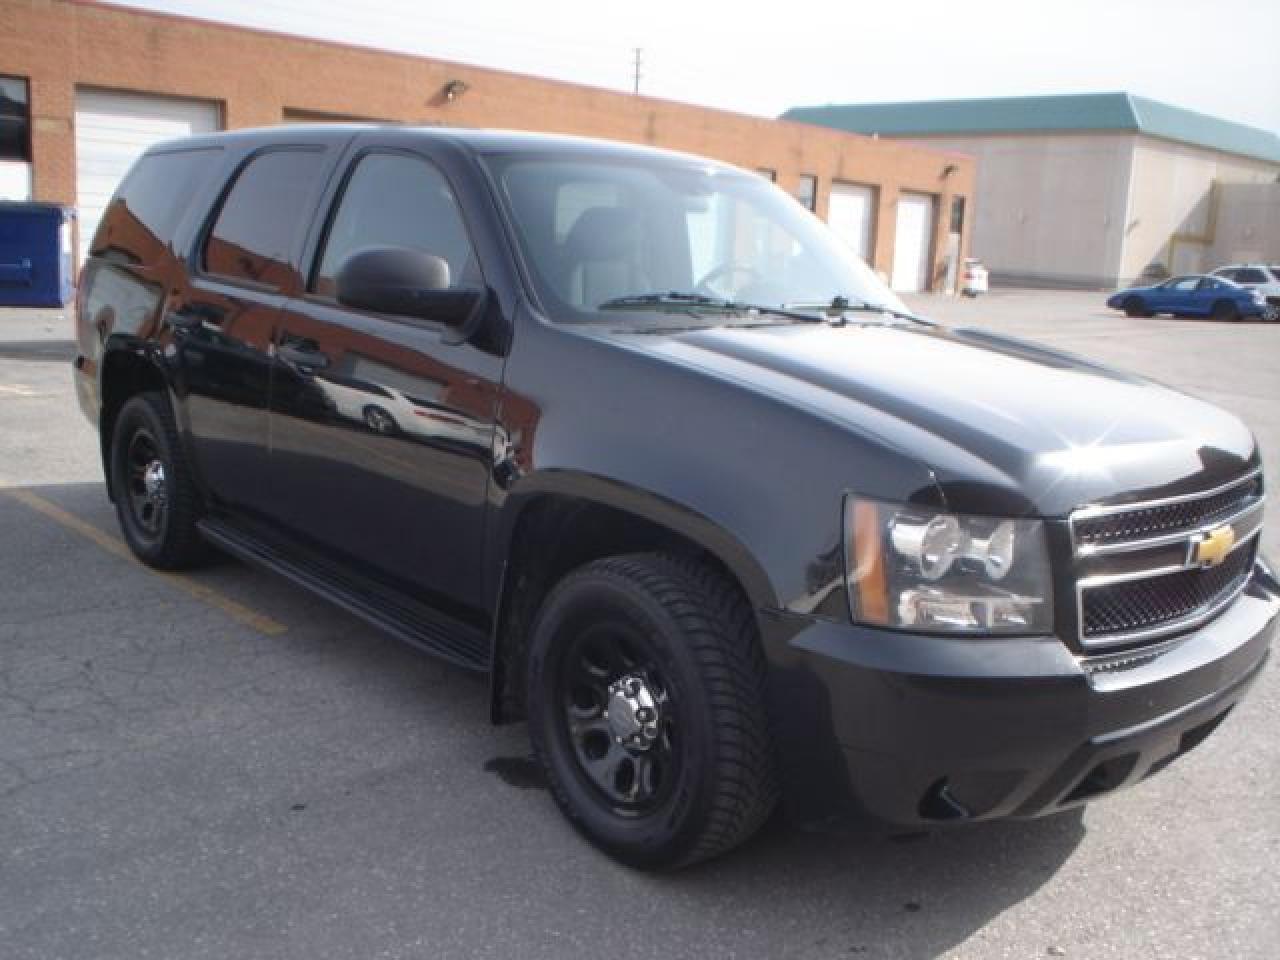 2014 Chevrolet Tahoe blk/blk ex police